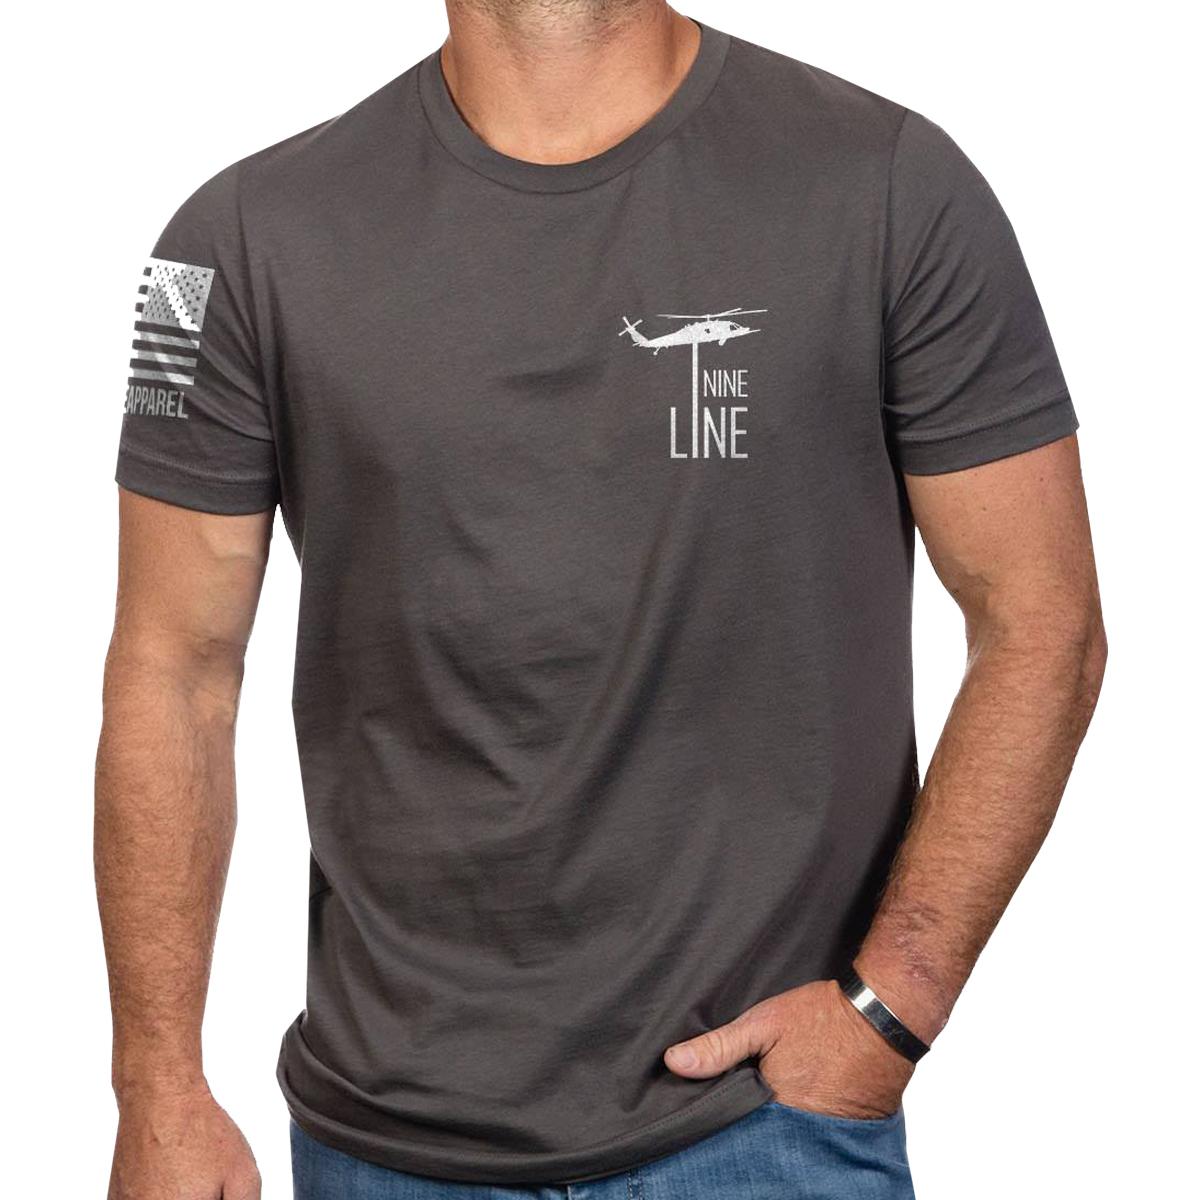 Details about Nine Line Apparel I Stand Short Sleeve T-Shirt